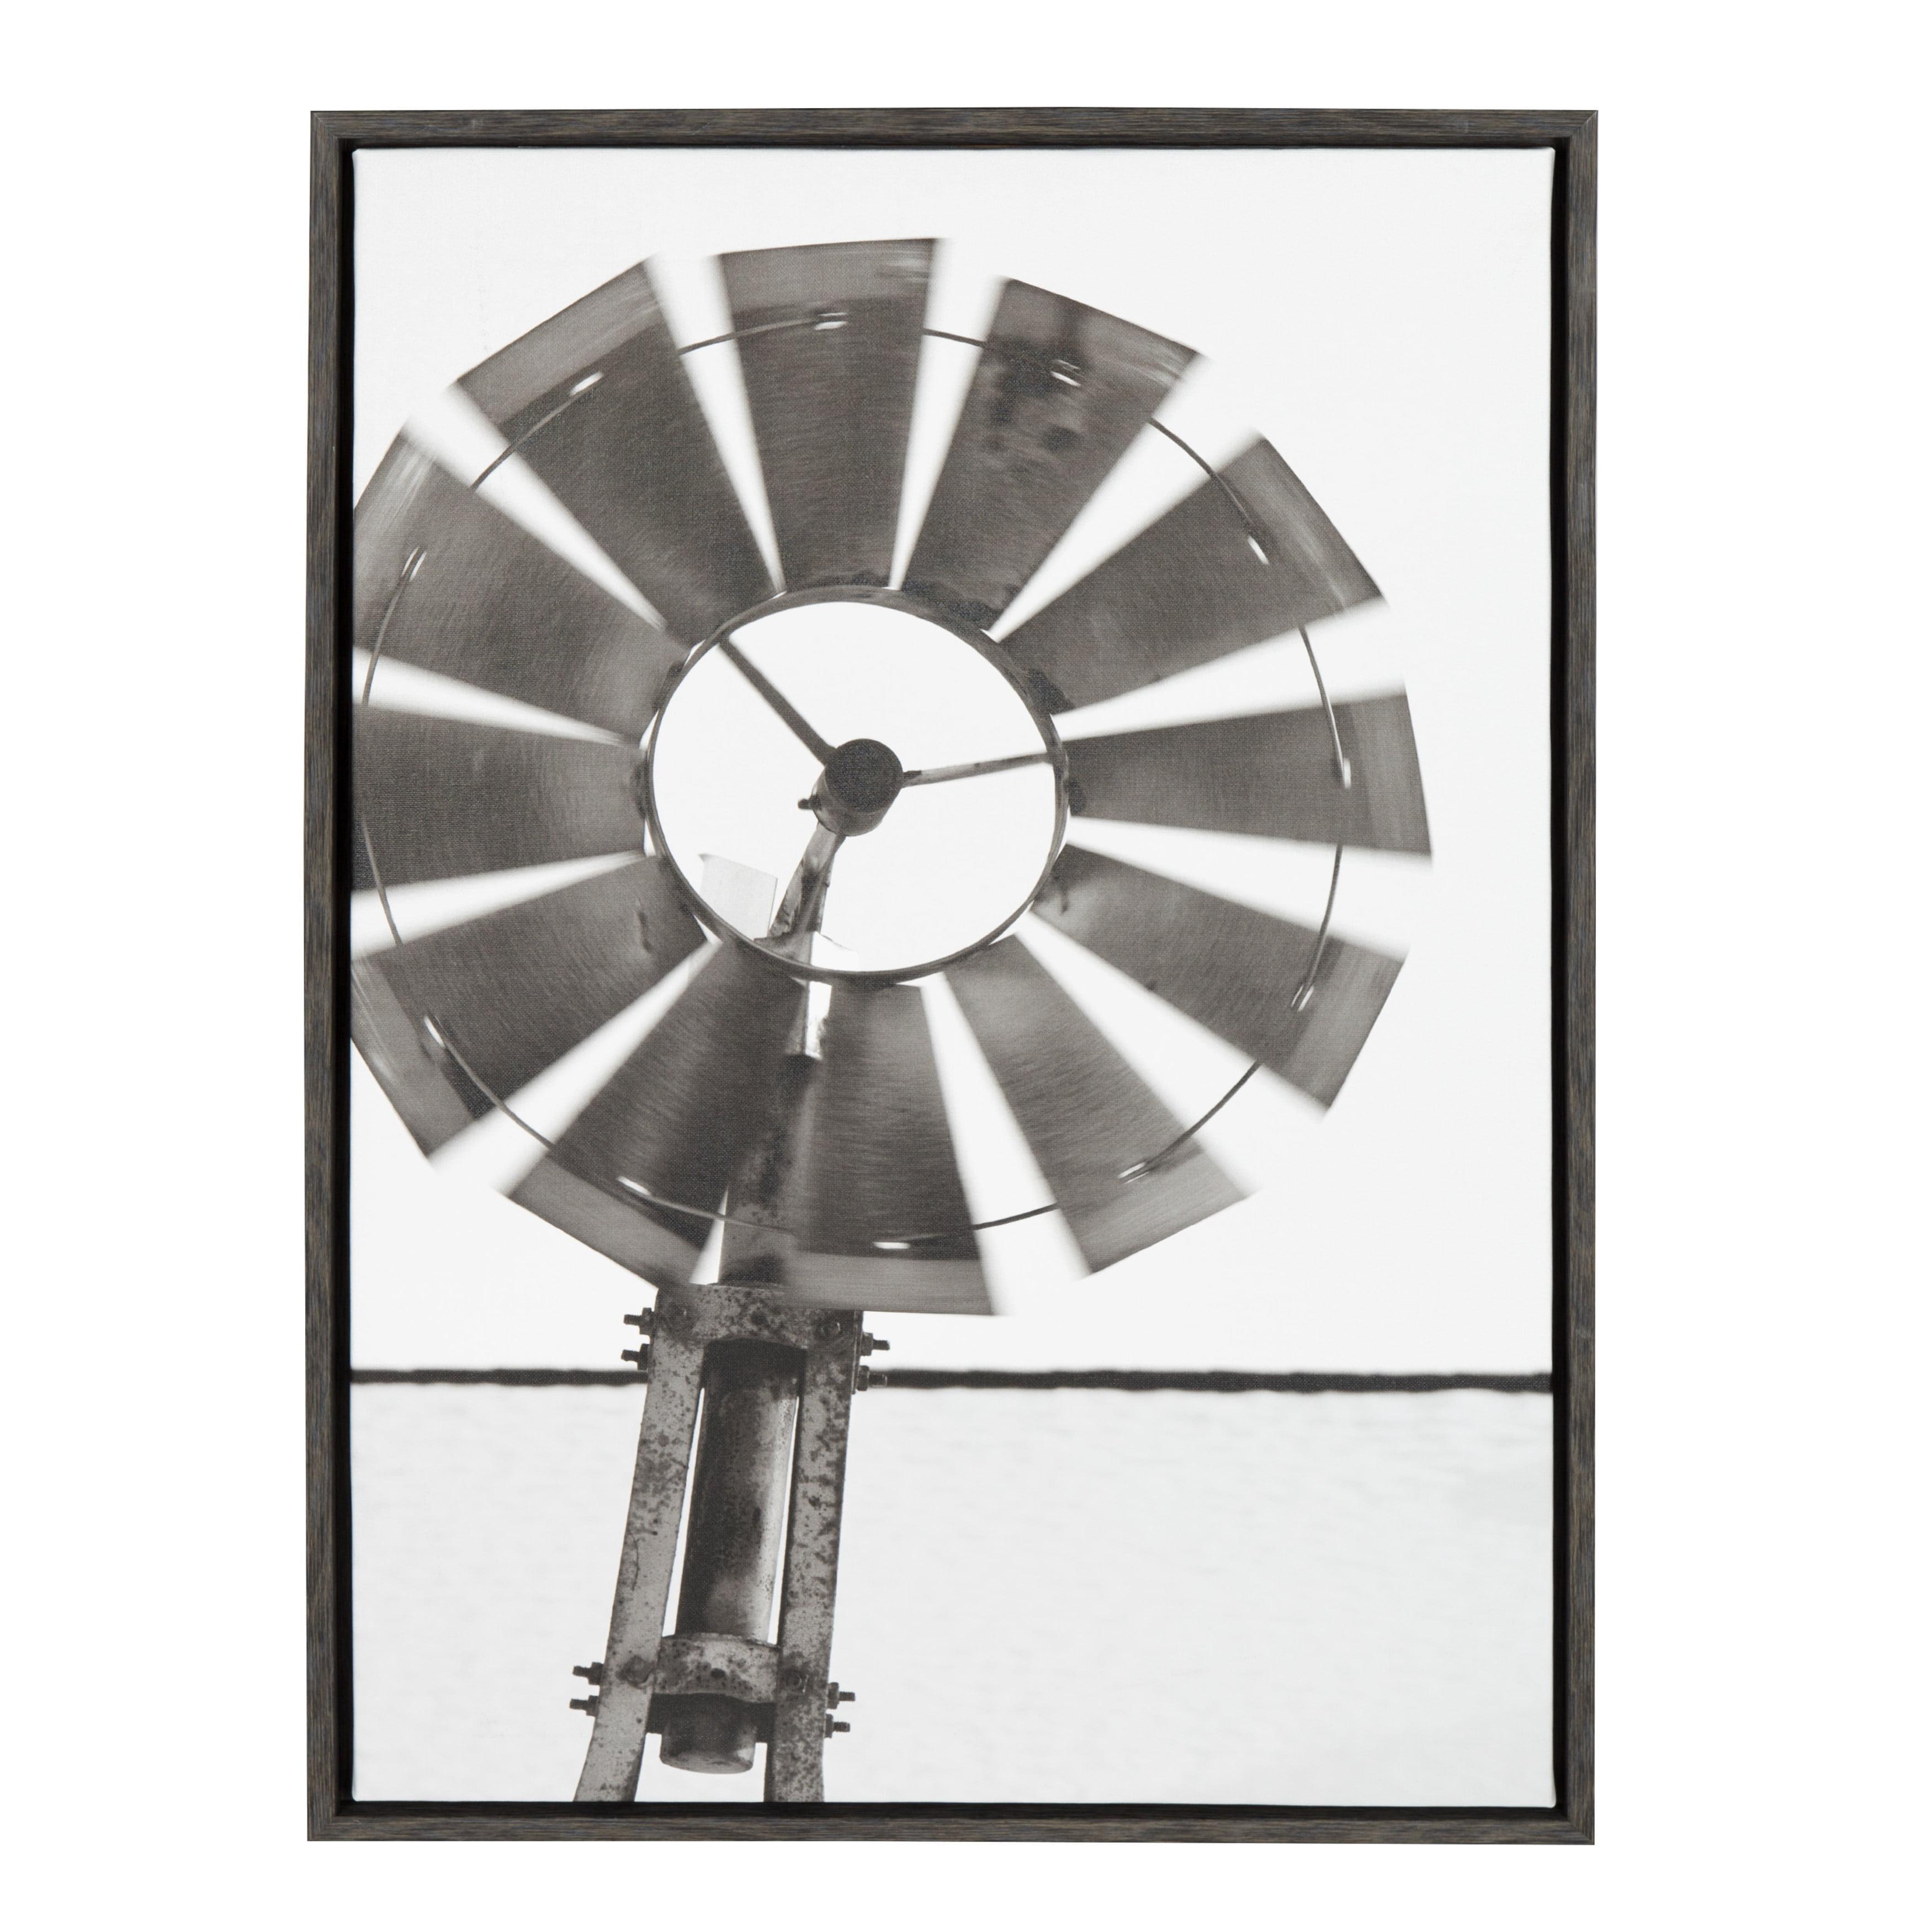 Kate and Laurel Sylvie Rustic Windmill 23x33 Dark Gray Framed Canvas Wall Art by Jami Skarda